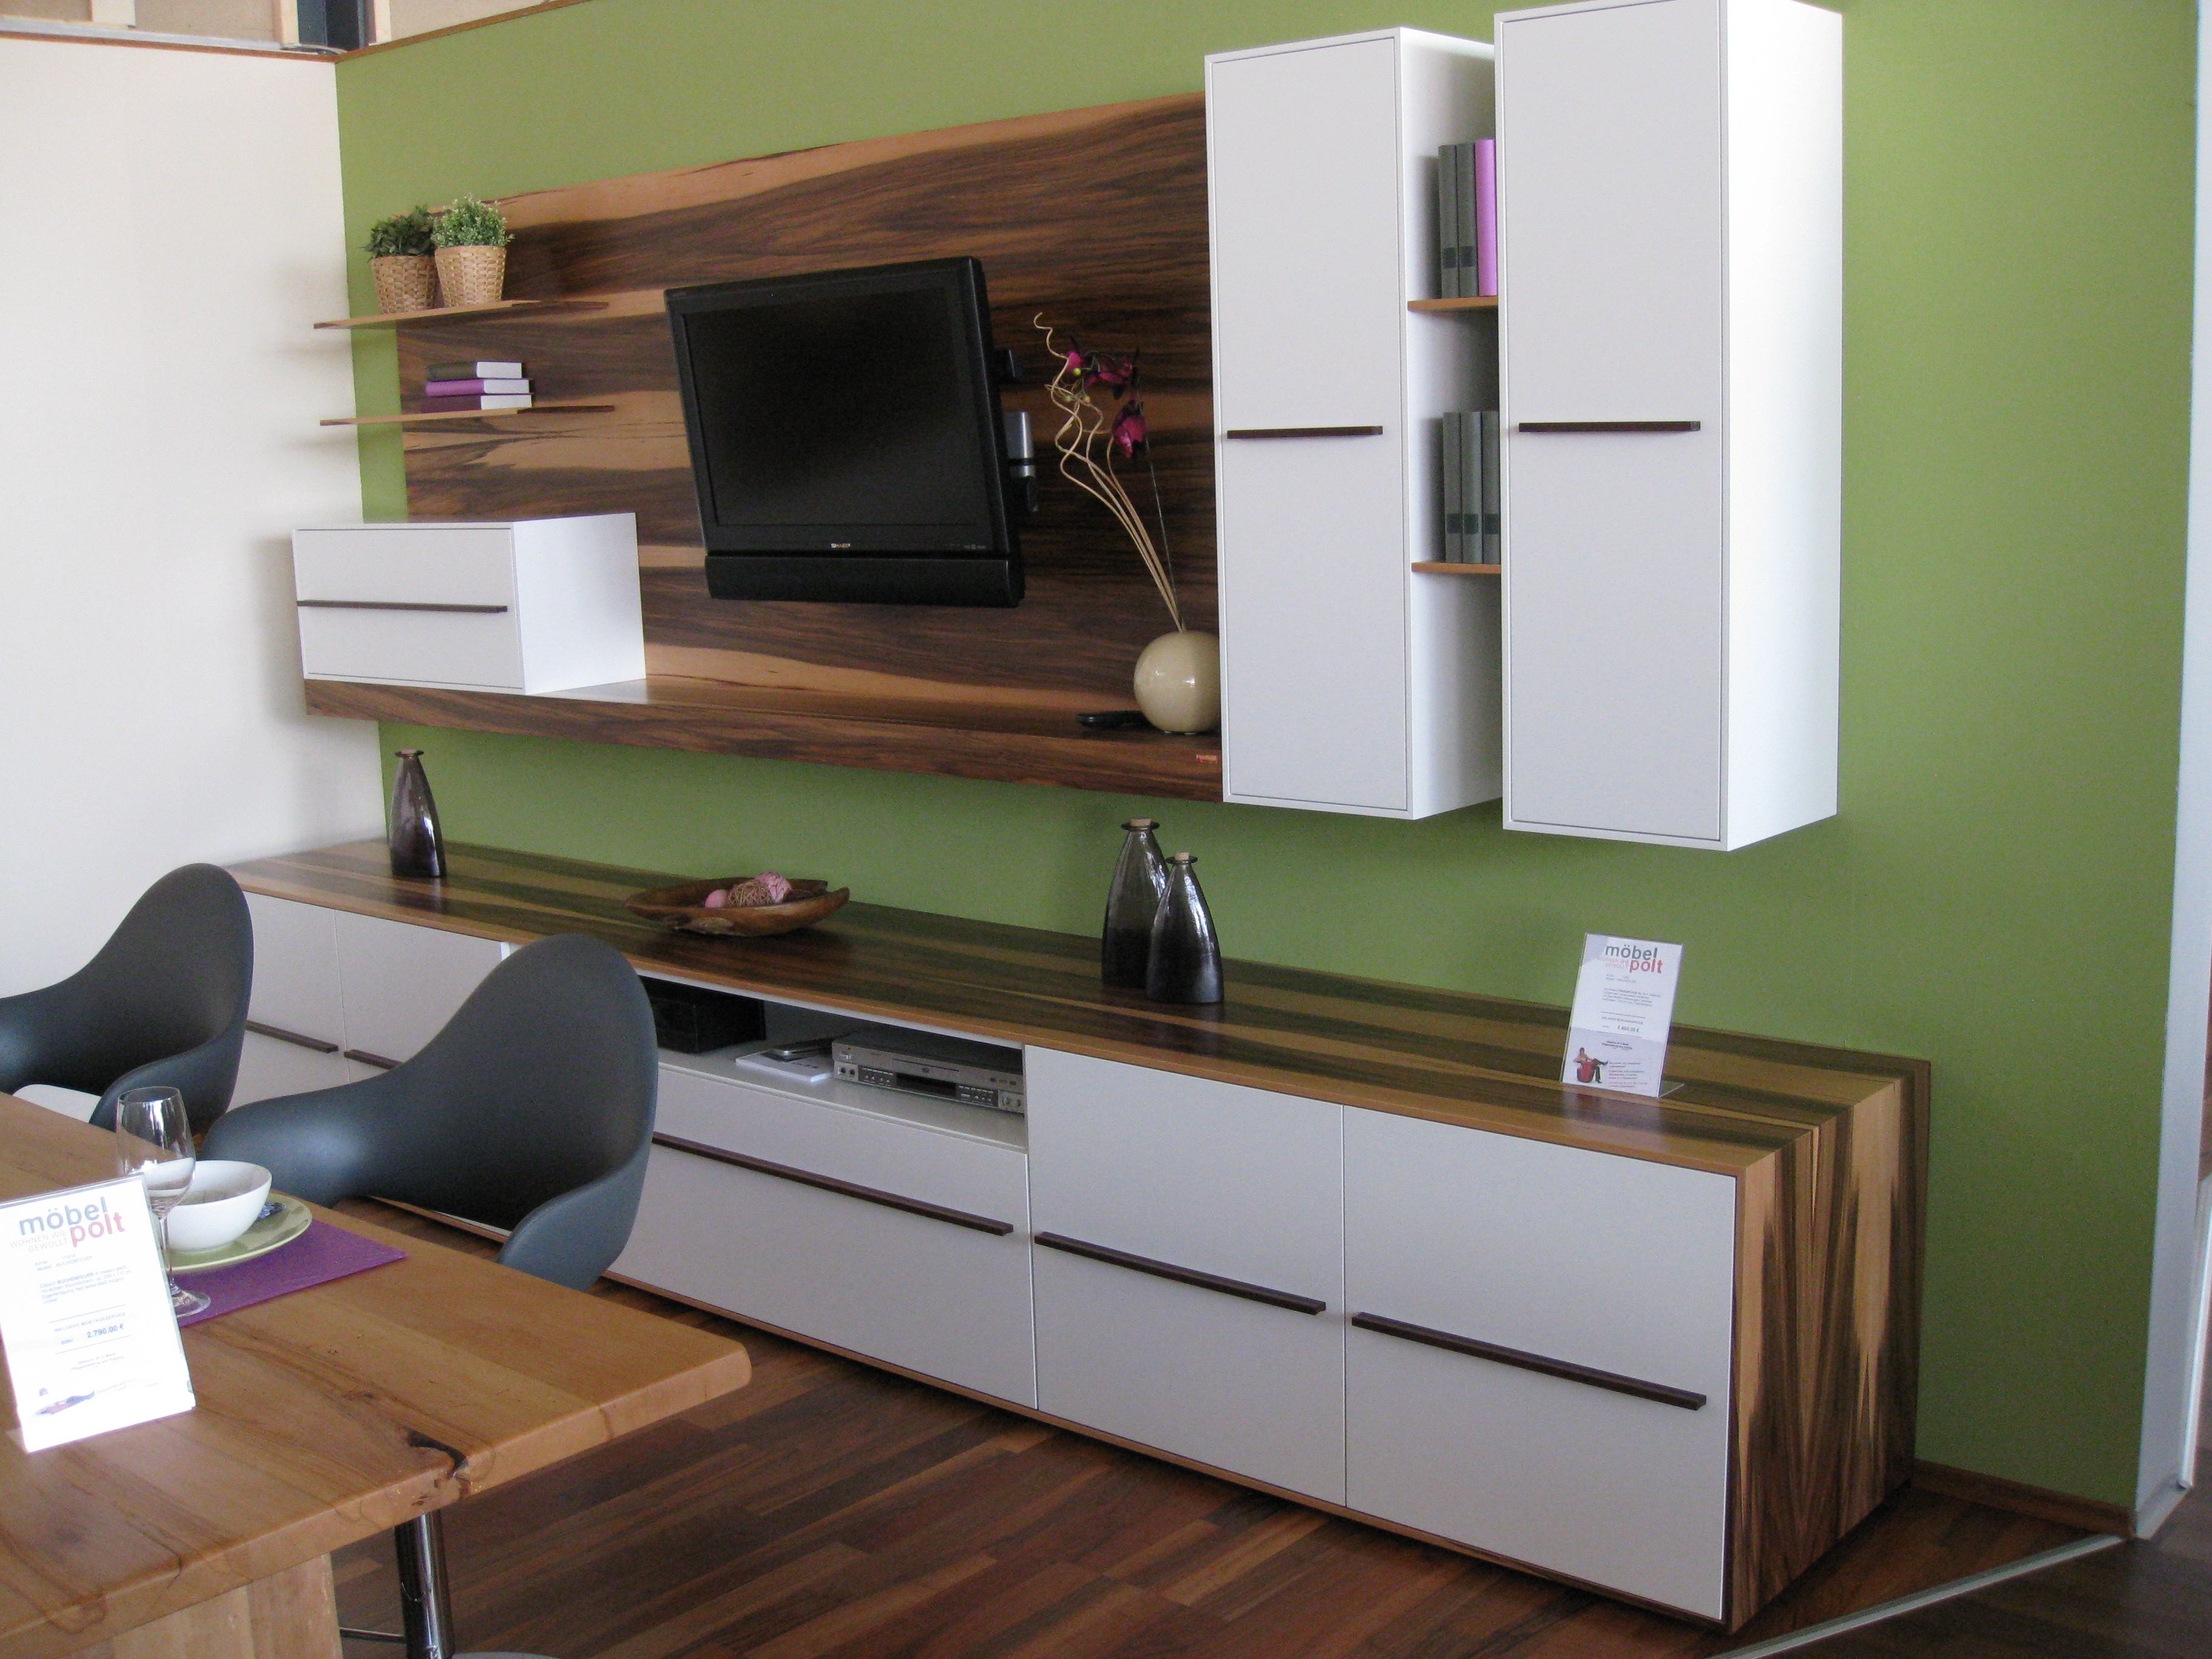 wohnwand erdenfeuer m bel polt m belhaus. Black Bedroom Furniture Sets. Home Design Ideas